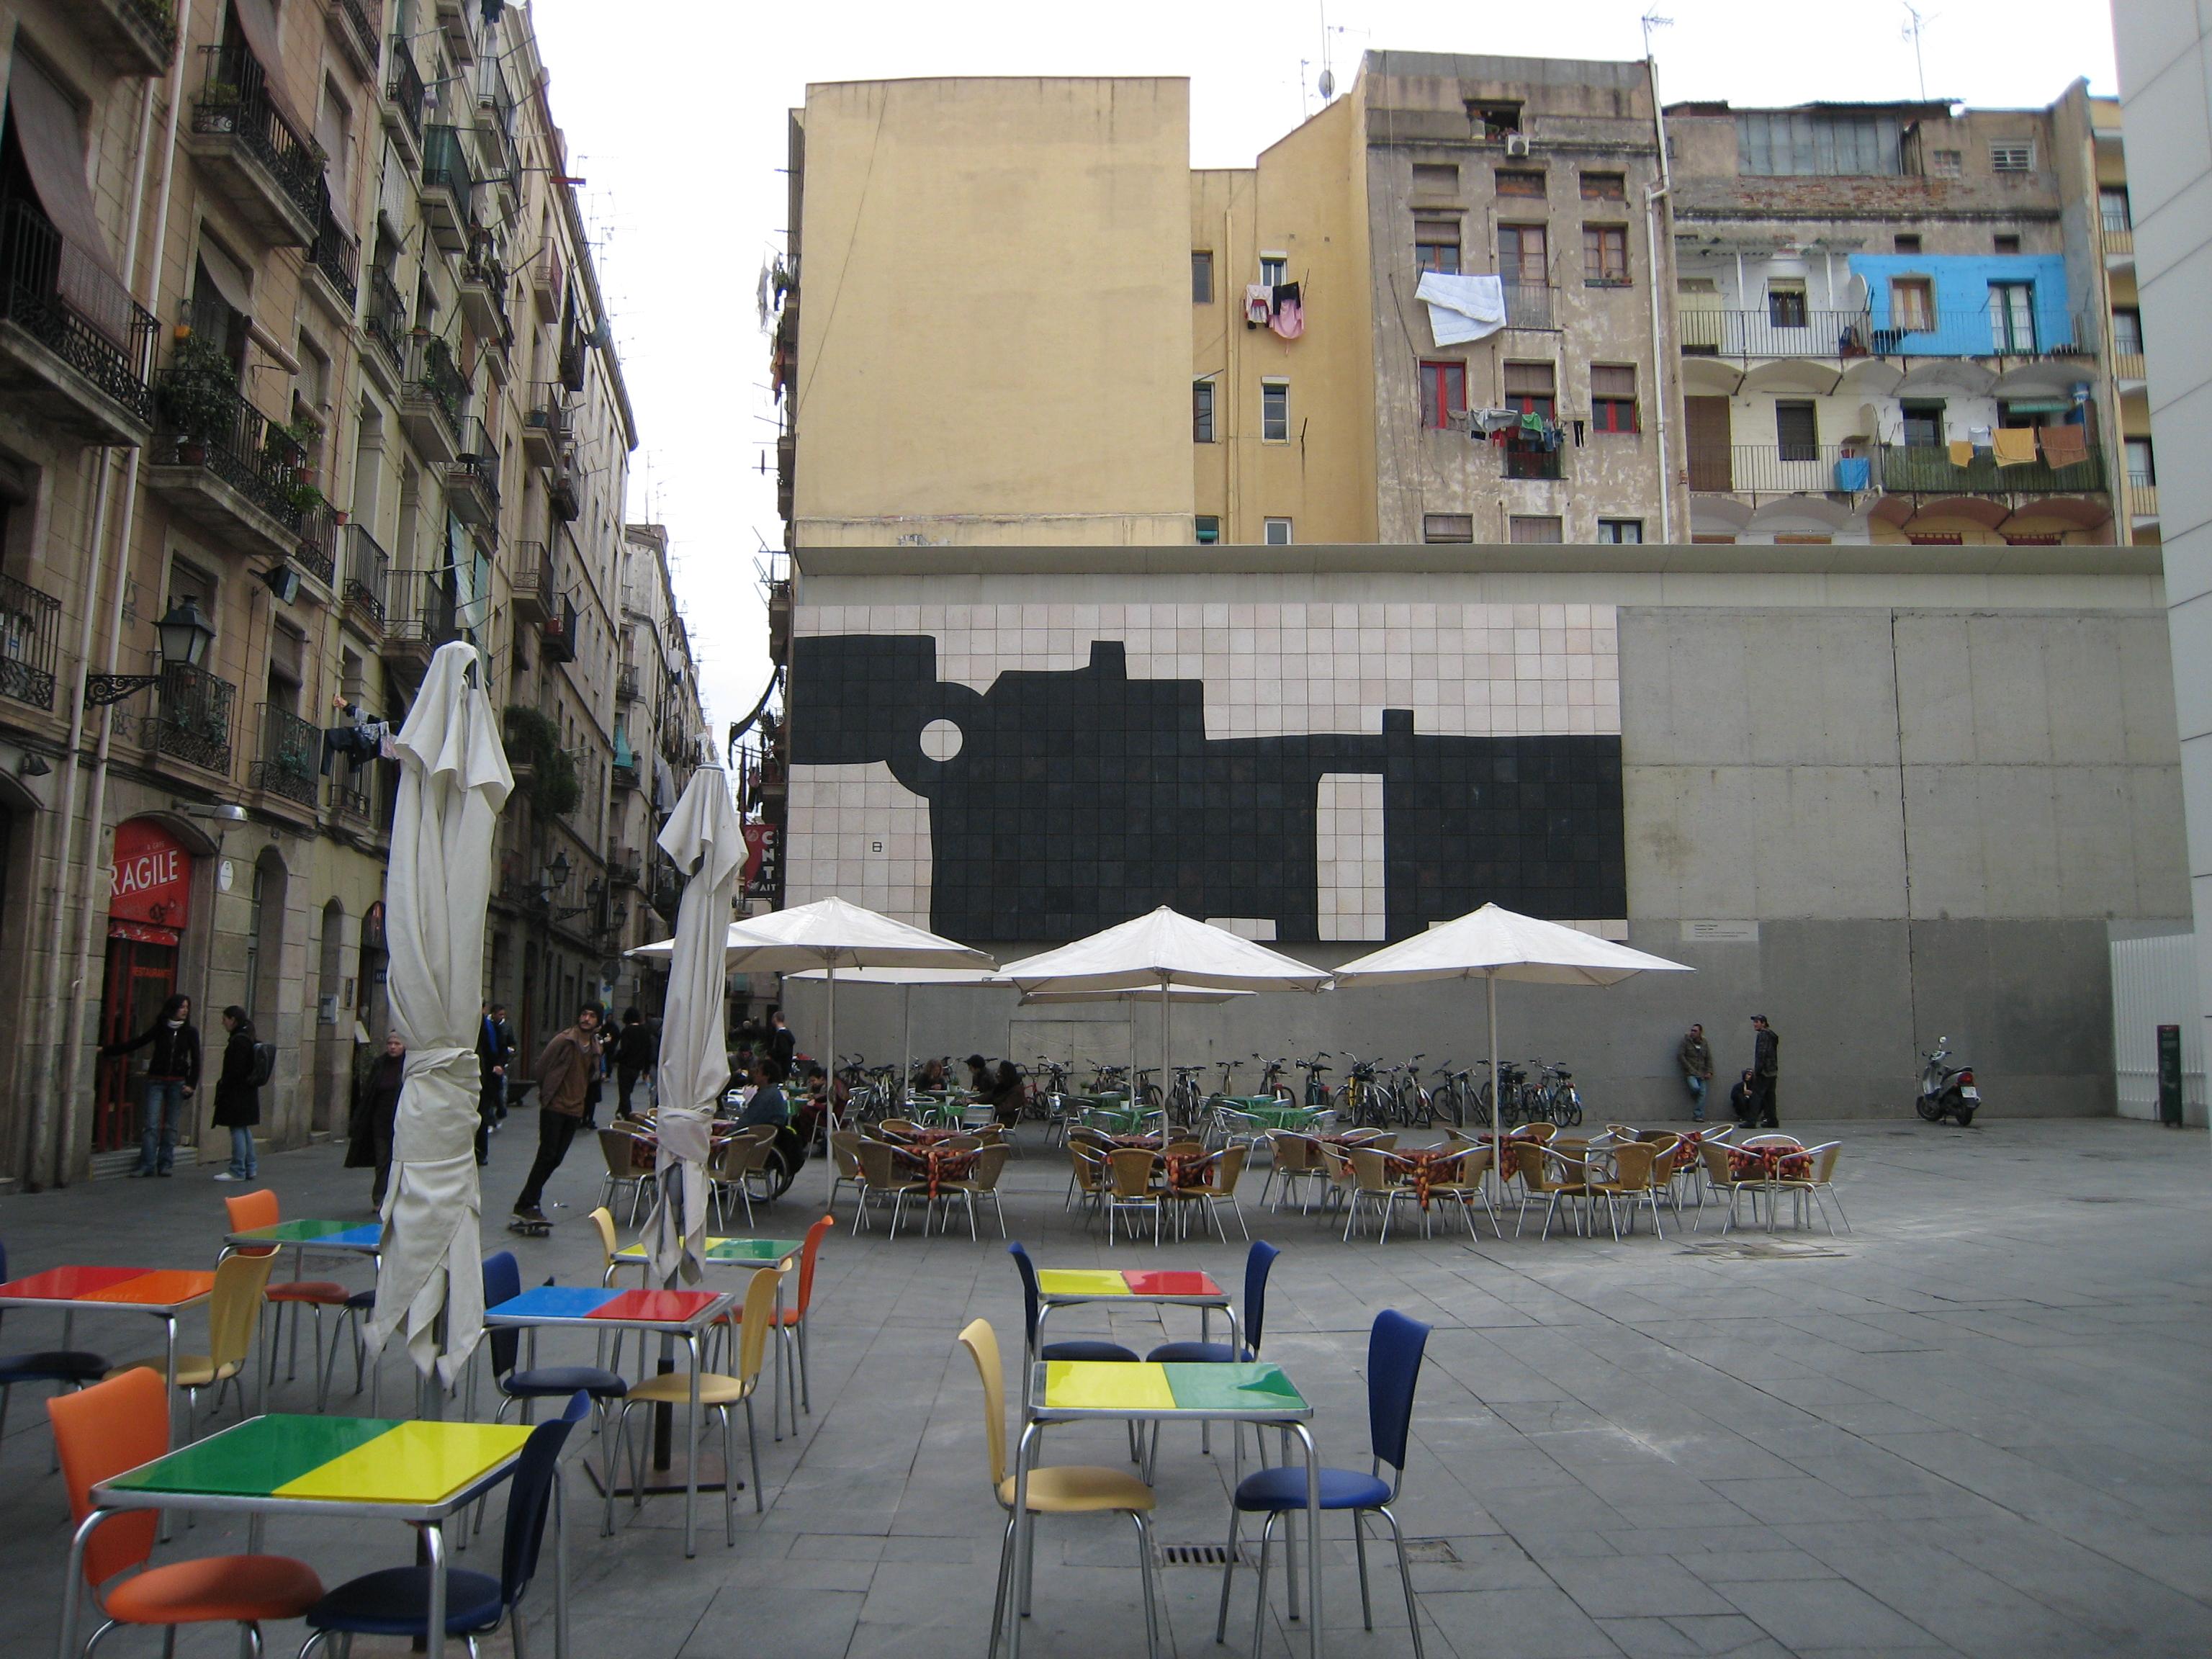 <p><strong>Unitat de Paisatge: </strong>Pla de Barcelona</p> <p><strong>Autor:</strong> Anna Jiménez</p> <p><strong>Crèdit:</strong> Arxiu d'imatges de l'Observatori del Paisatge de Catalunya</p> <p><strong>Reproducció:</strong> CC BY-NC-ND 4.0</p>  <a href='http://arxiu.catpaisatge.net/wp-content/uploads/2019/10/0000003284-AIOPC.jpg'' class='download-button' download>Descarrega</a> <a href='http://arxiu.catpaisatge.net/cercador/?o=&w=id%3A0000003284&f=altText&l=15&t=-creation&c=1&lang=ca&view=global&s=0' target='blank' class='fitxa-button' >Fitxa</a>